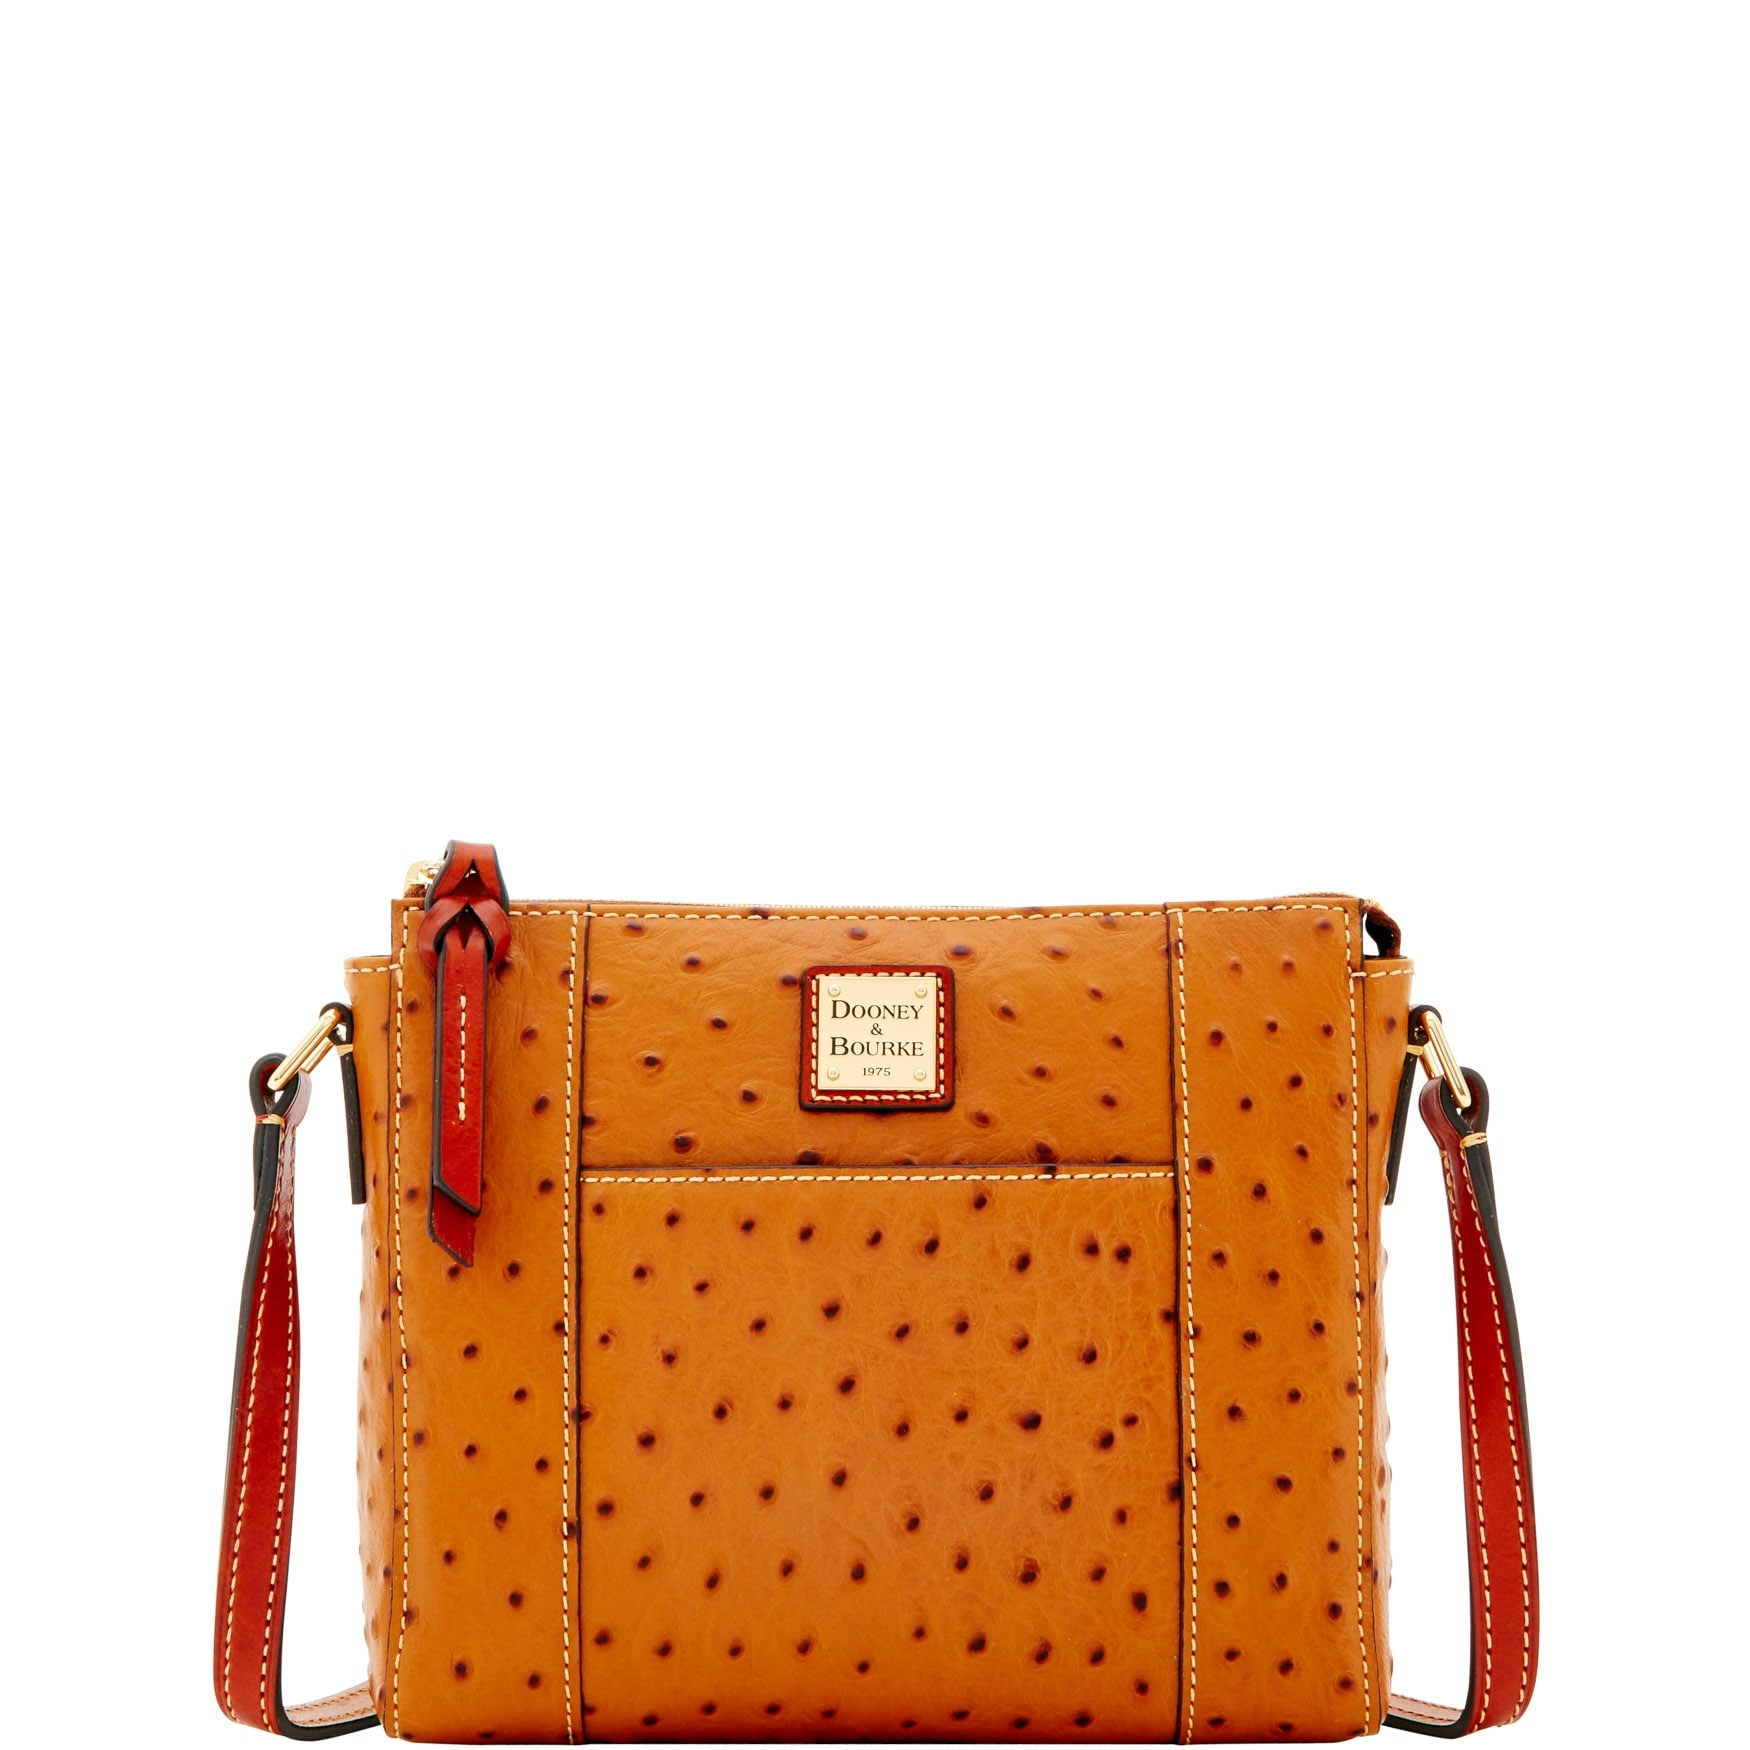 54aa3d4f0923 Designer Handbags